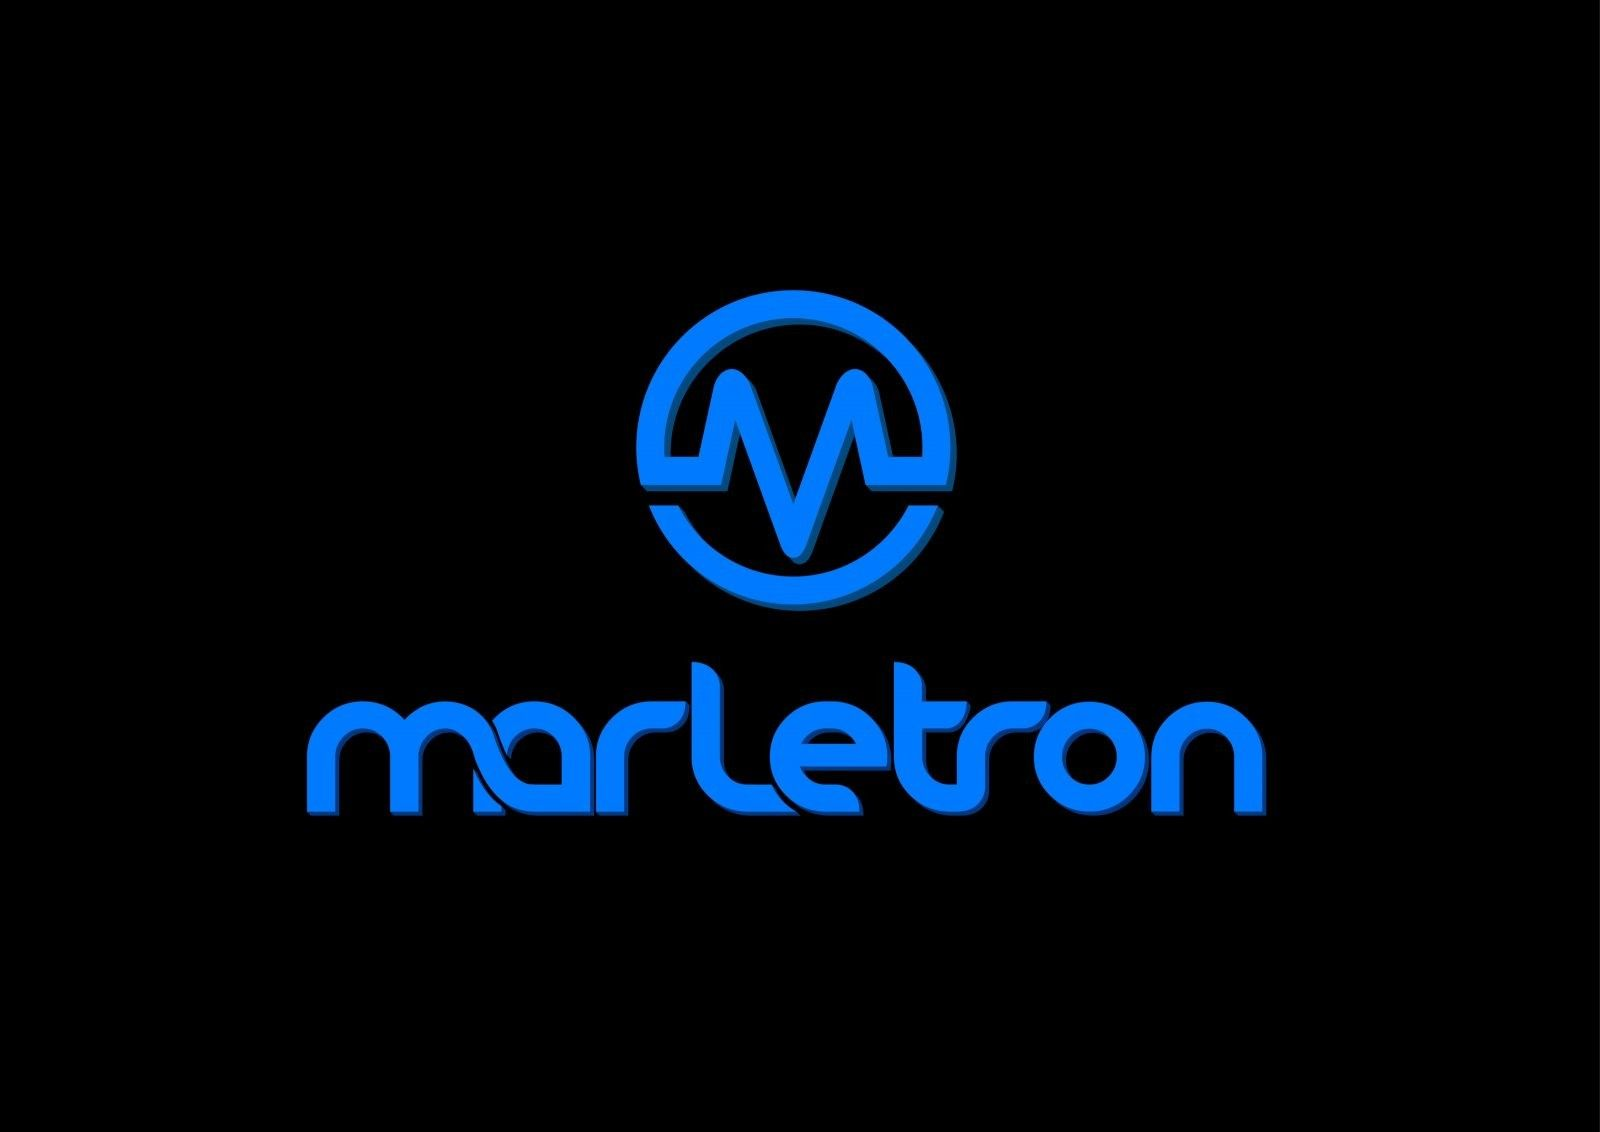 marletronpress.jpg